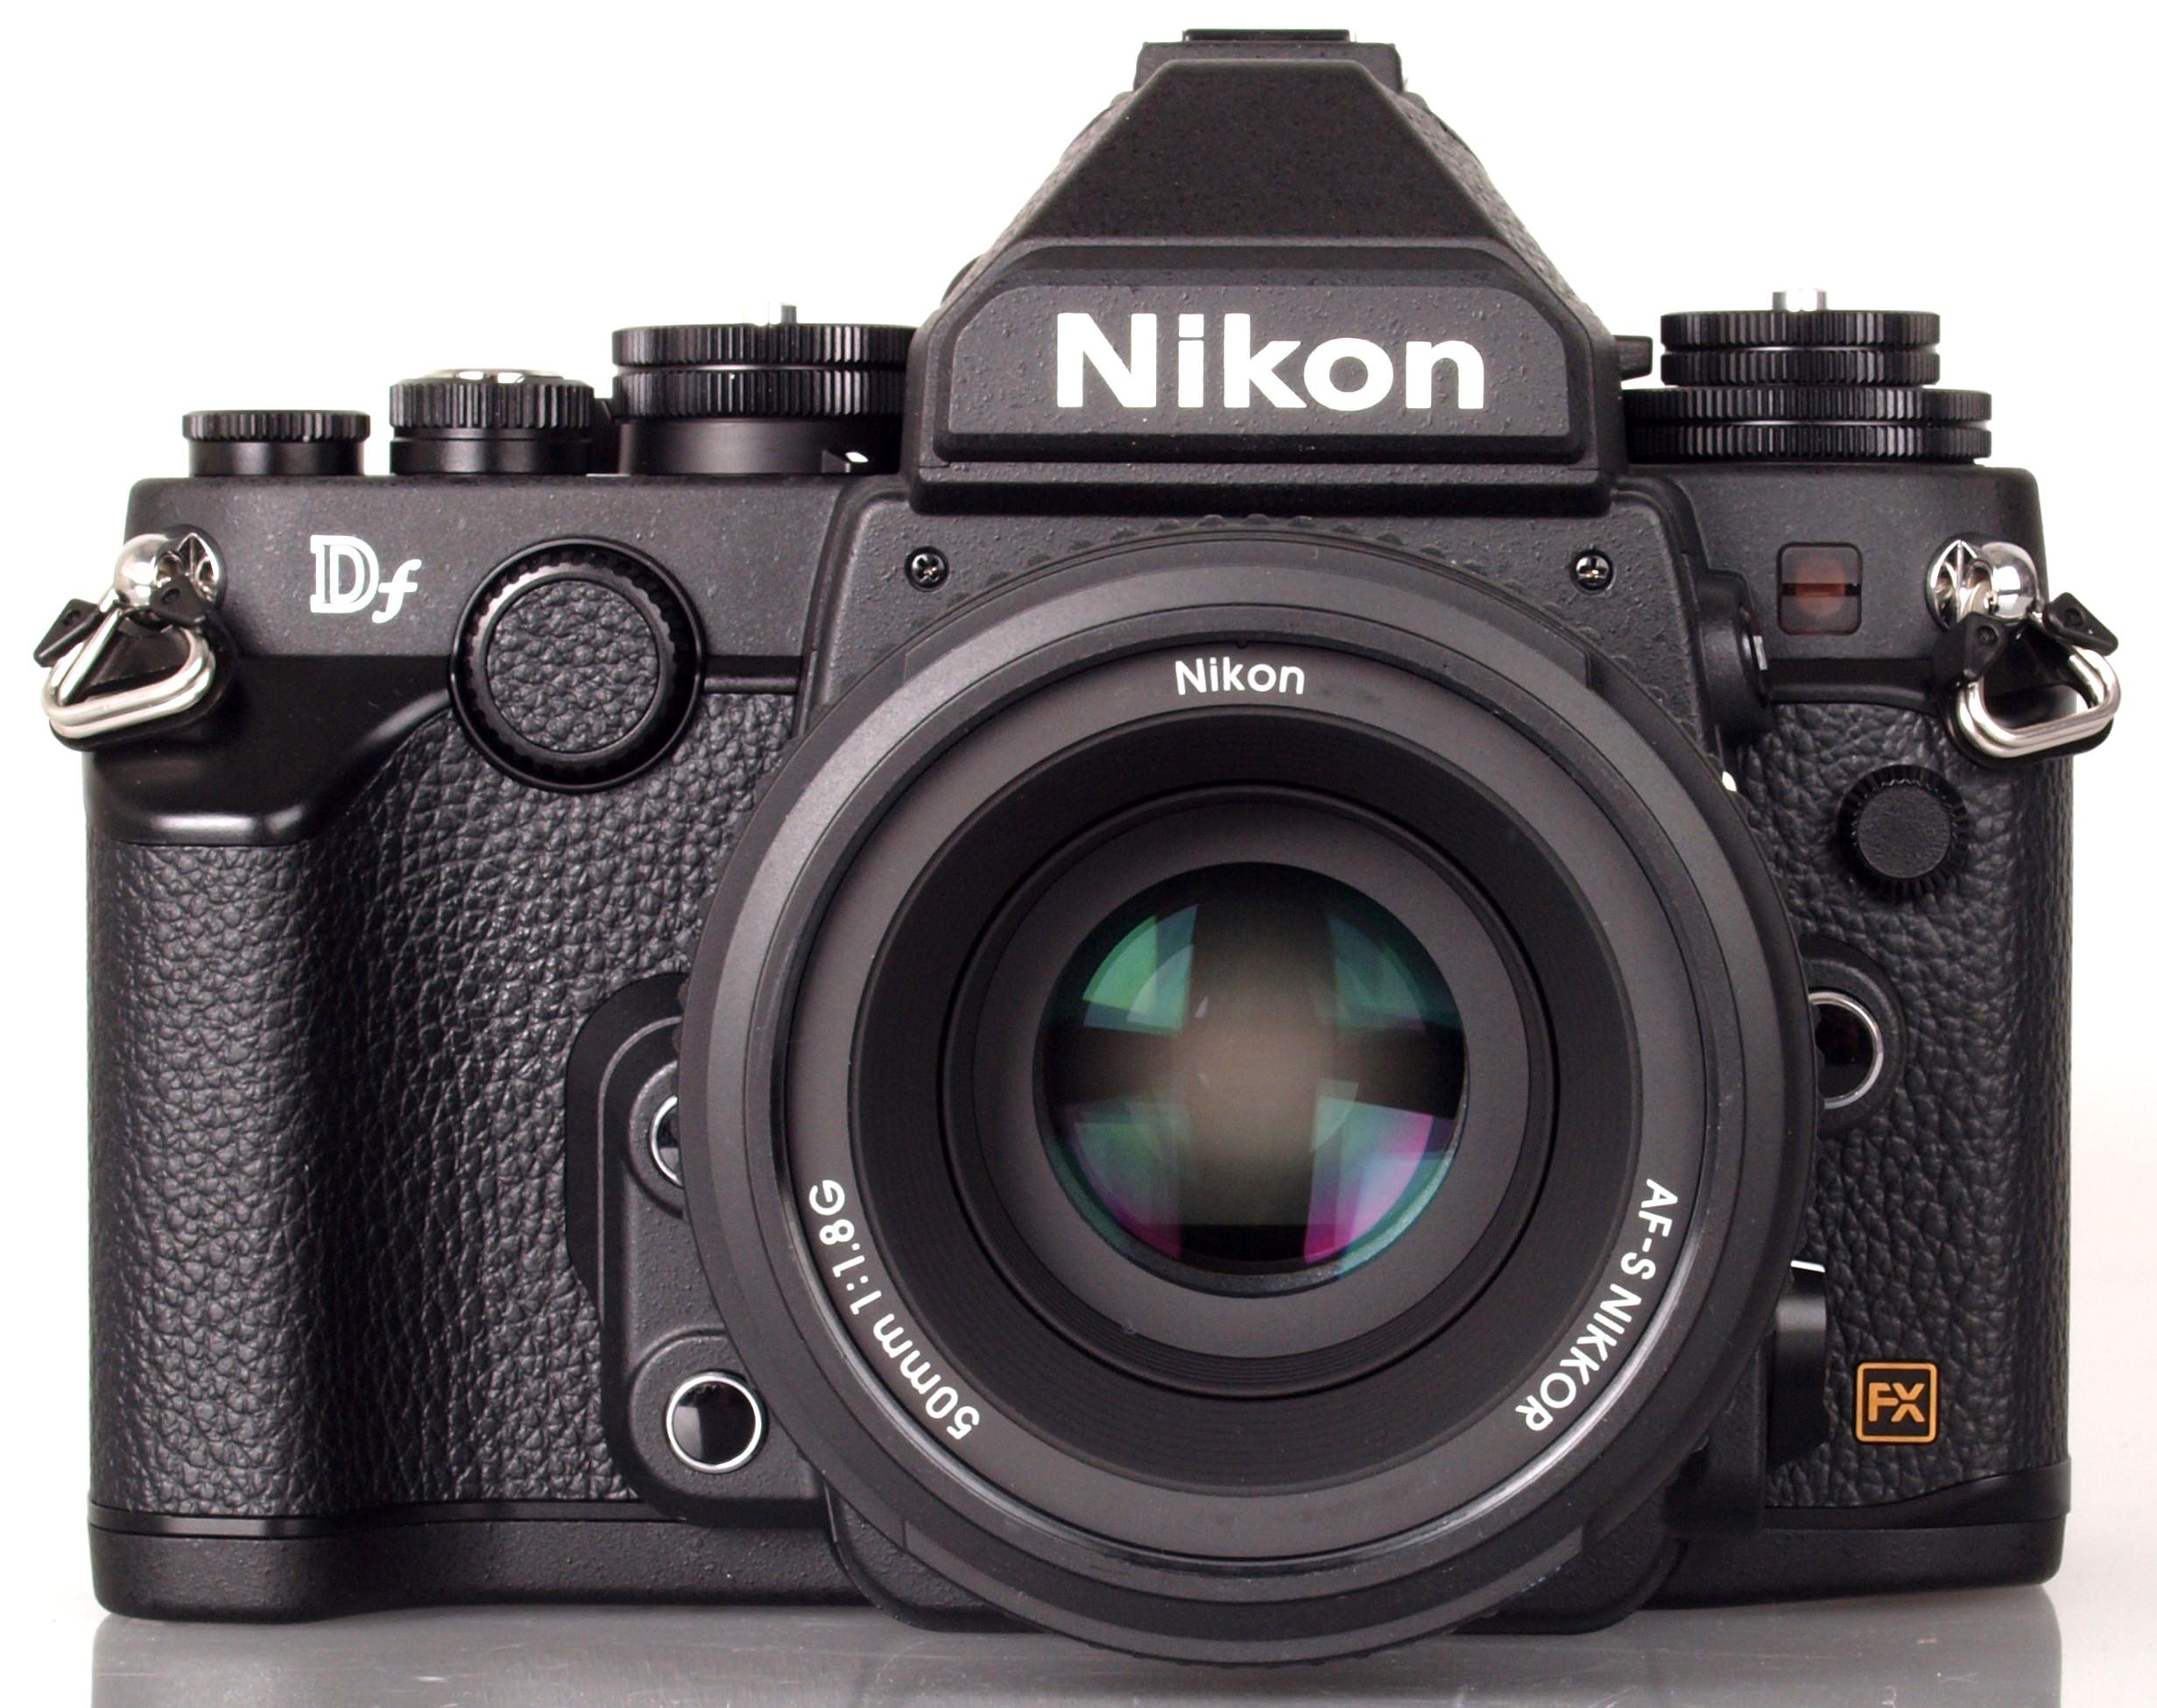 Nikon Imaging Products Nikon Df Nikon love t Nikon